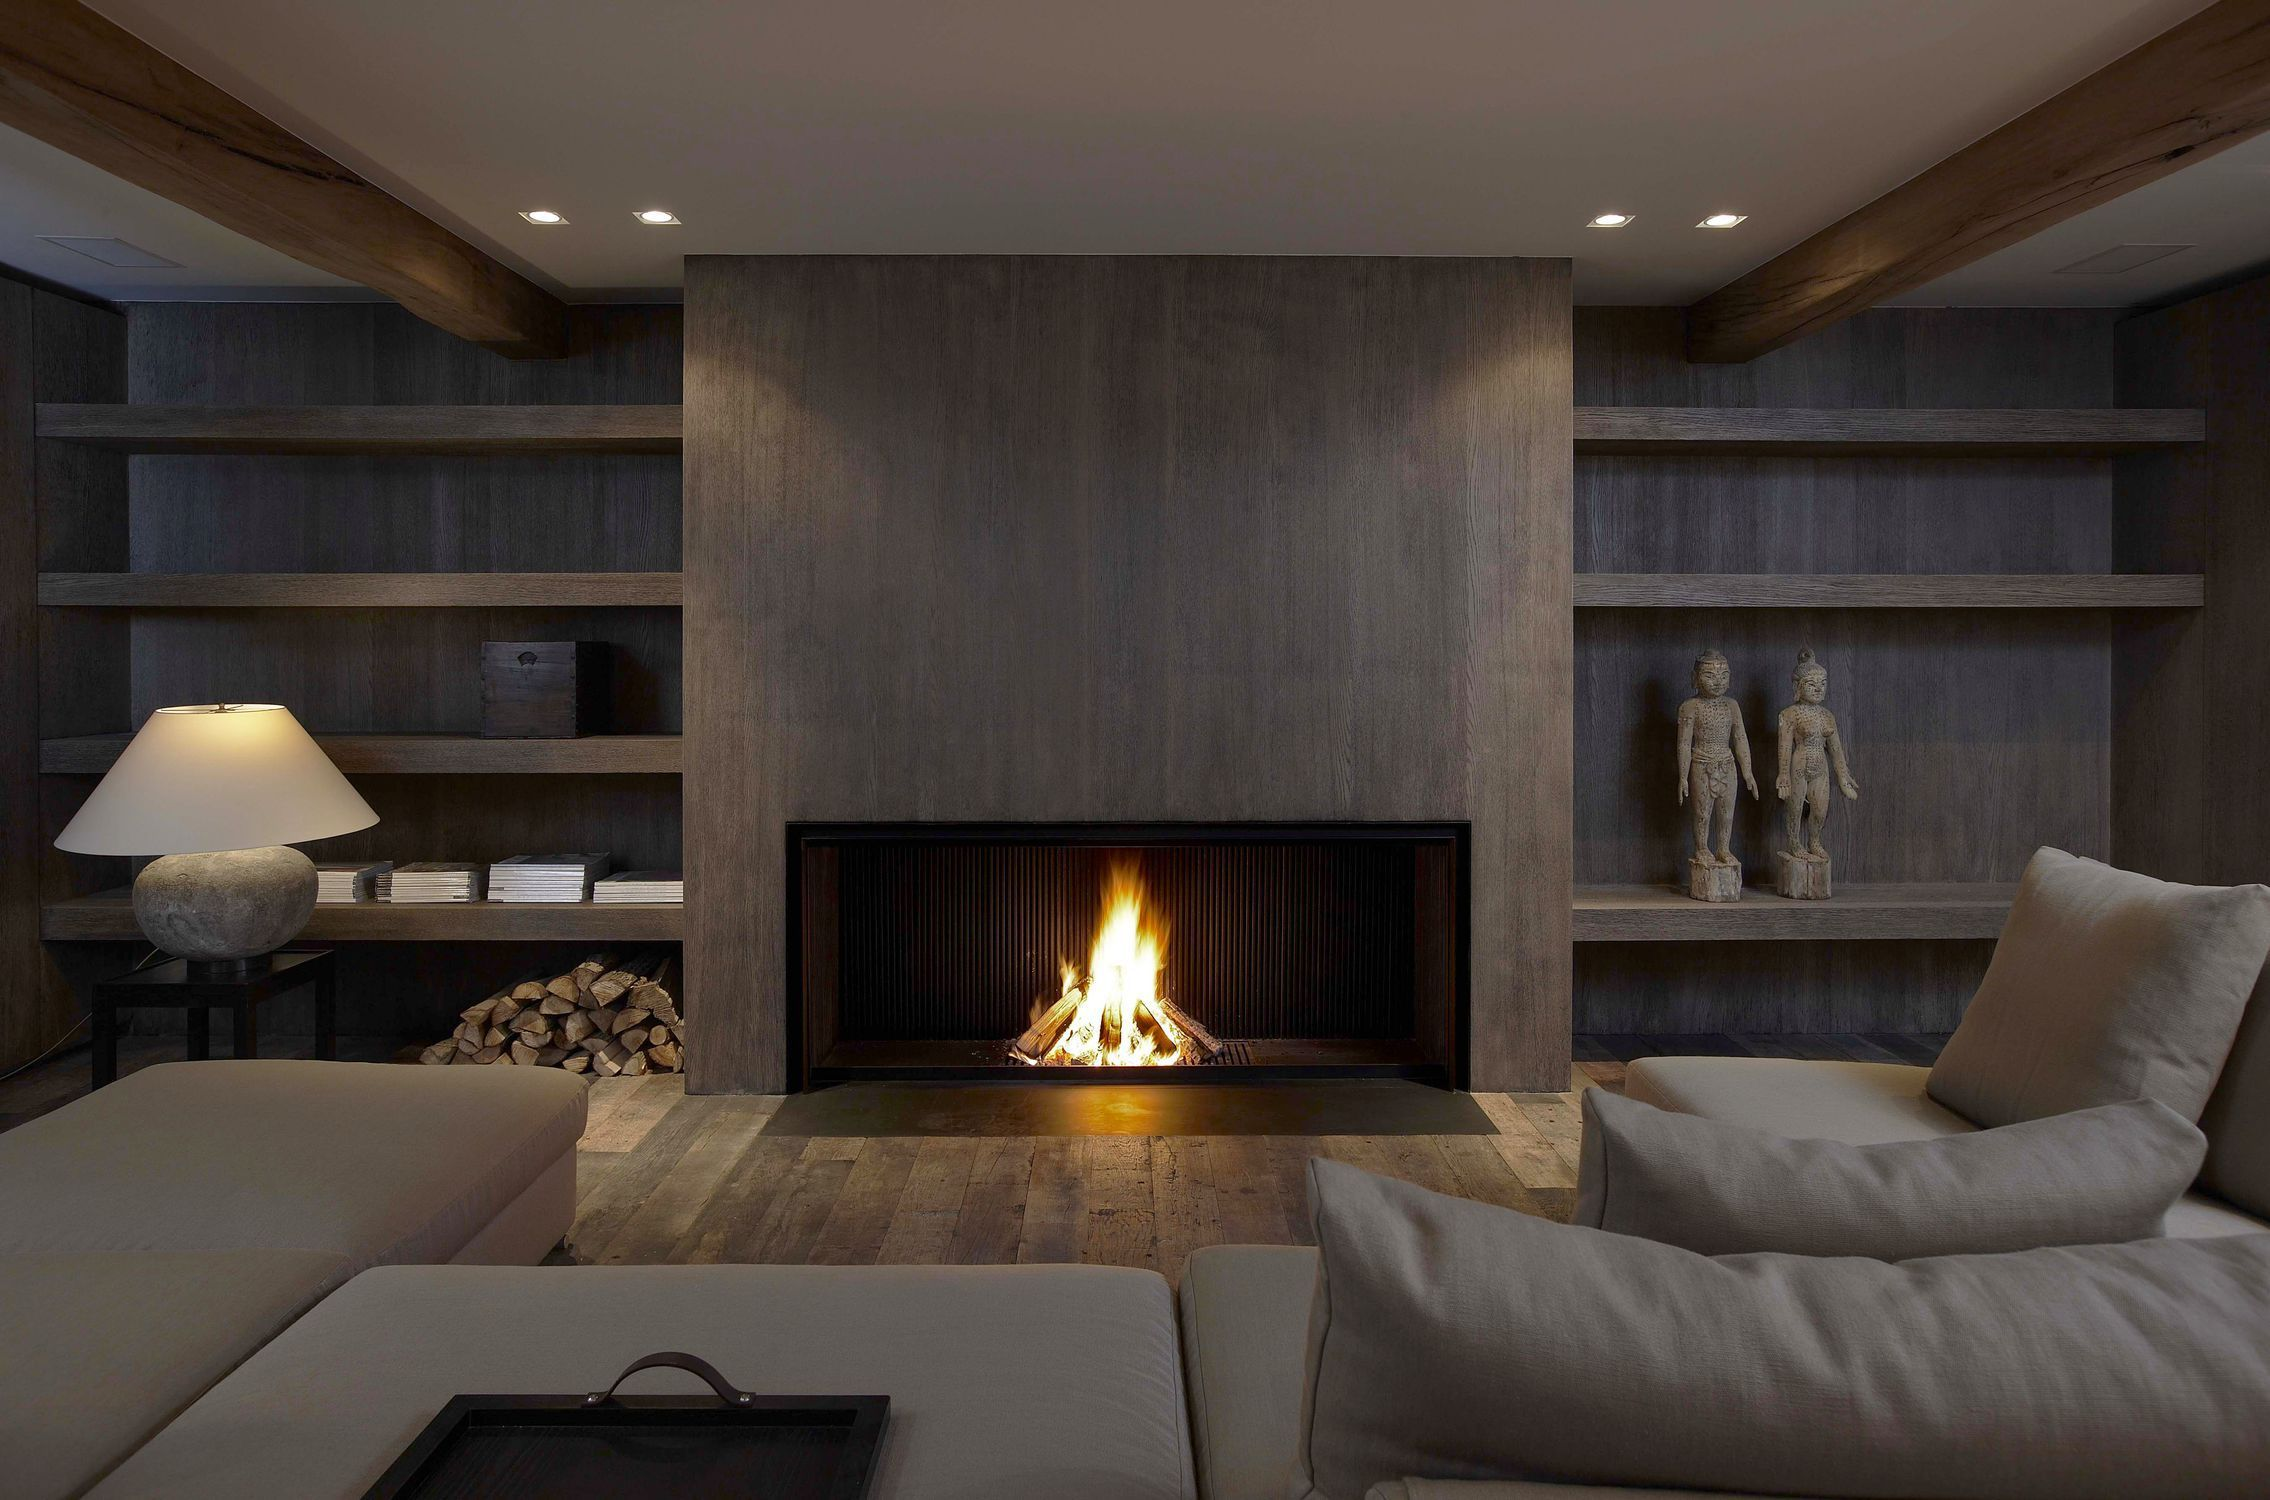 chemin e bois contemporaine design original foyer ouvert universal mf 1700 75 w. Black Bedroom Furniture Sets. Home Design Ideas